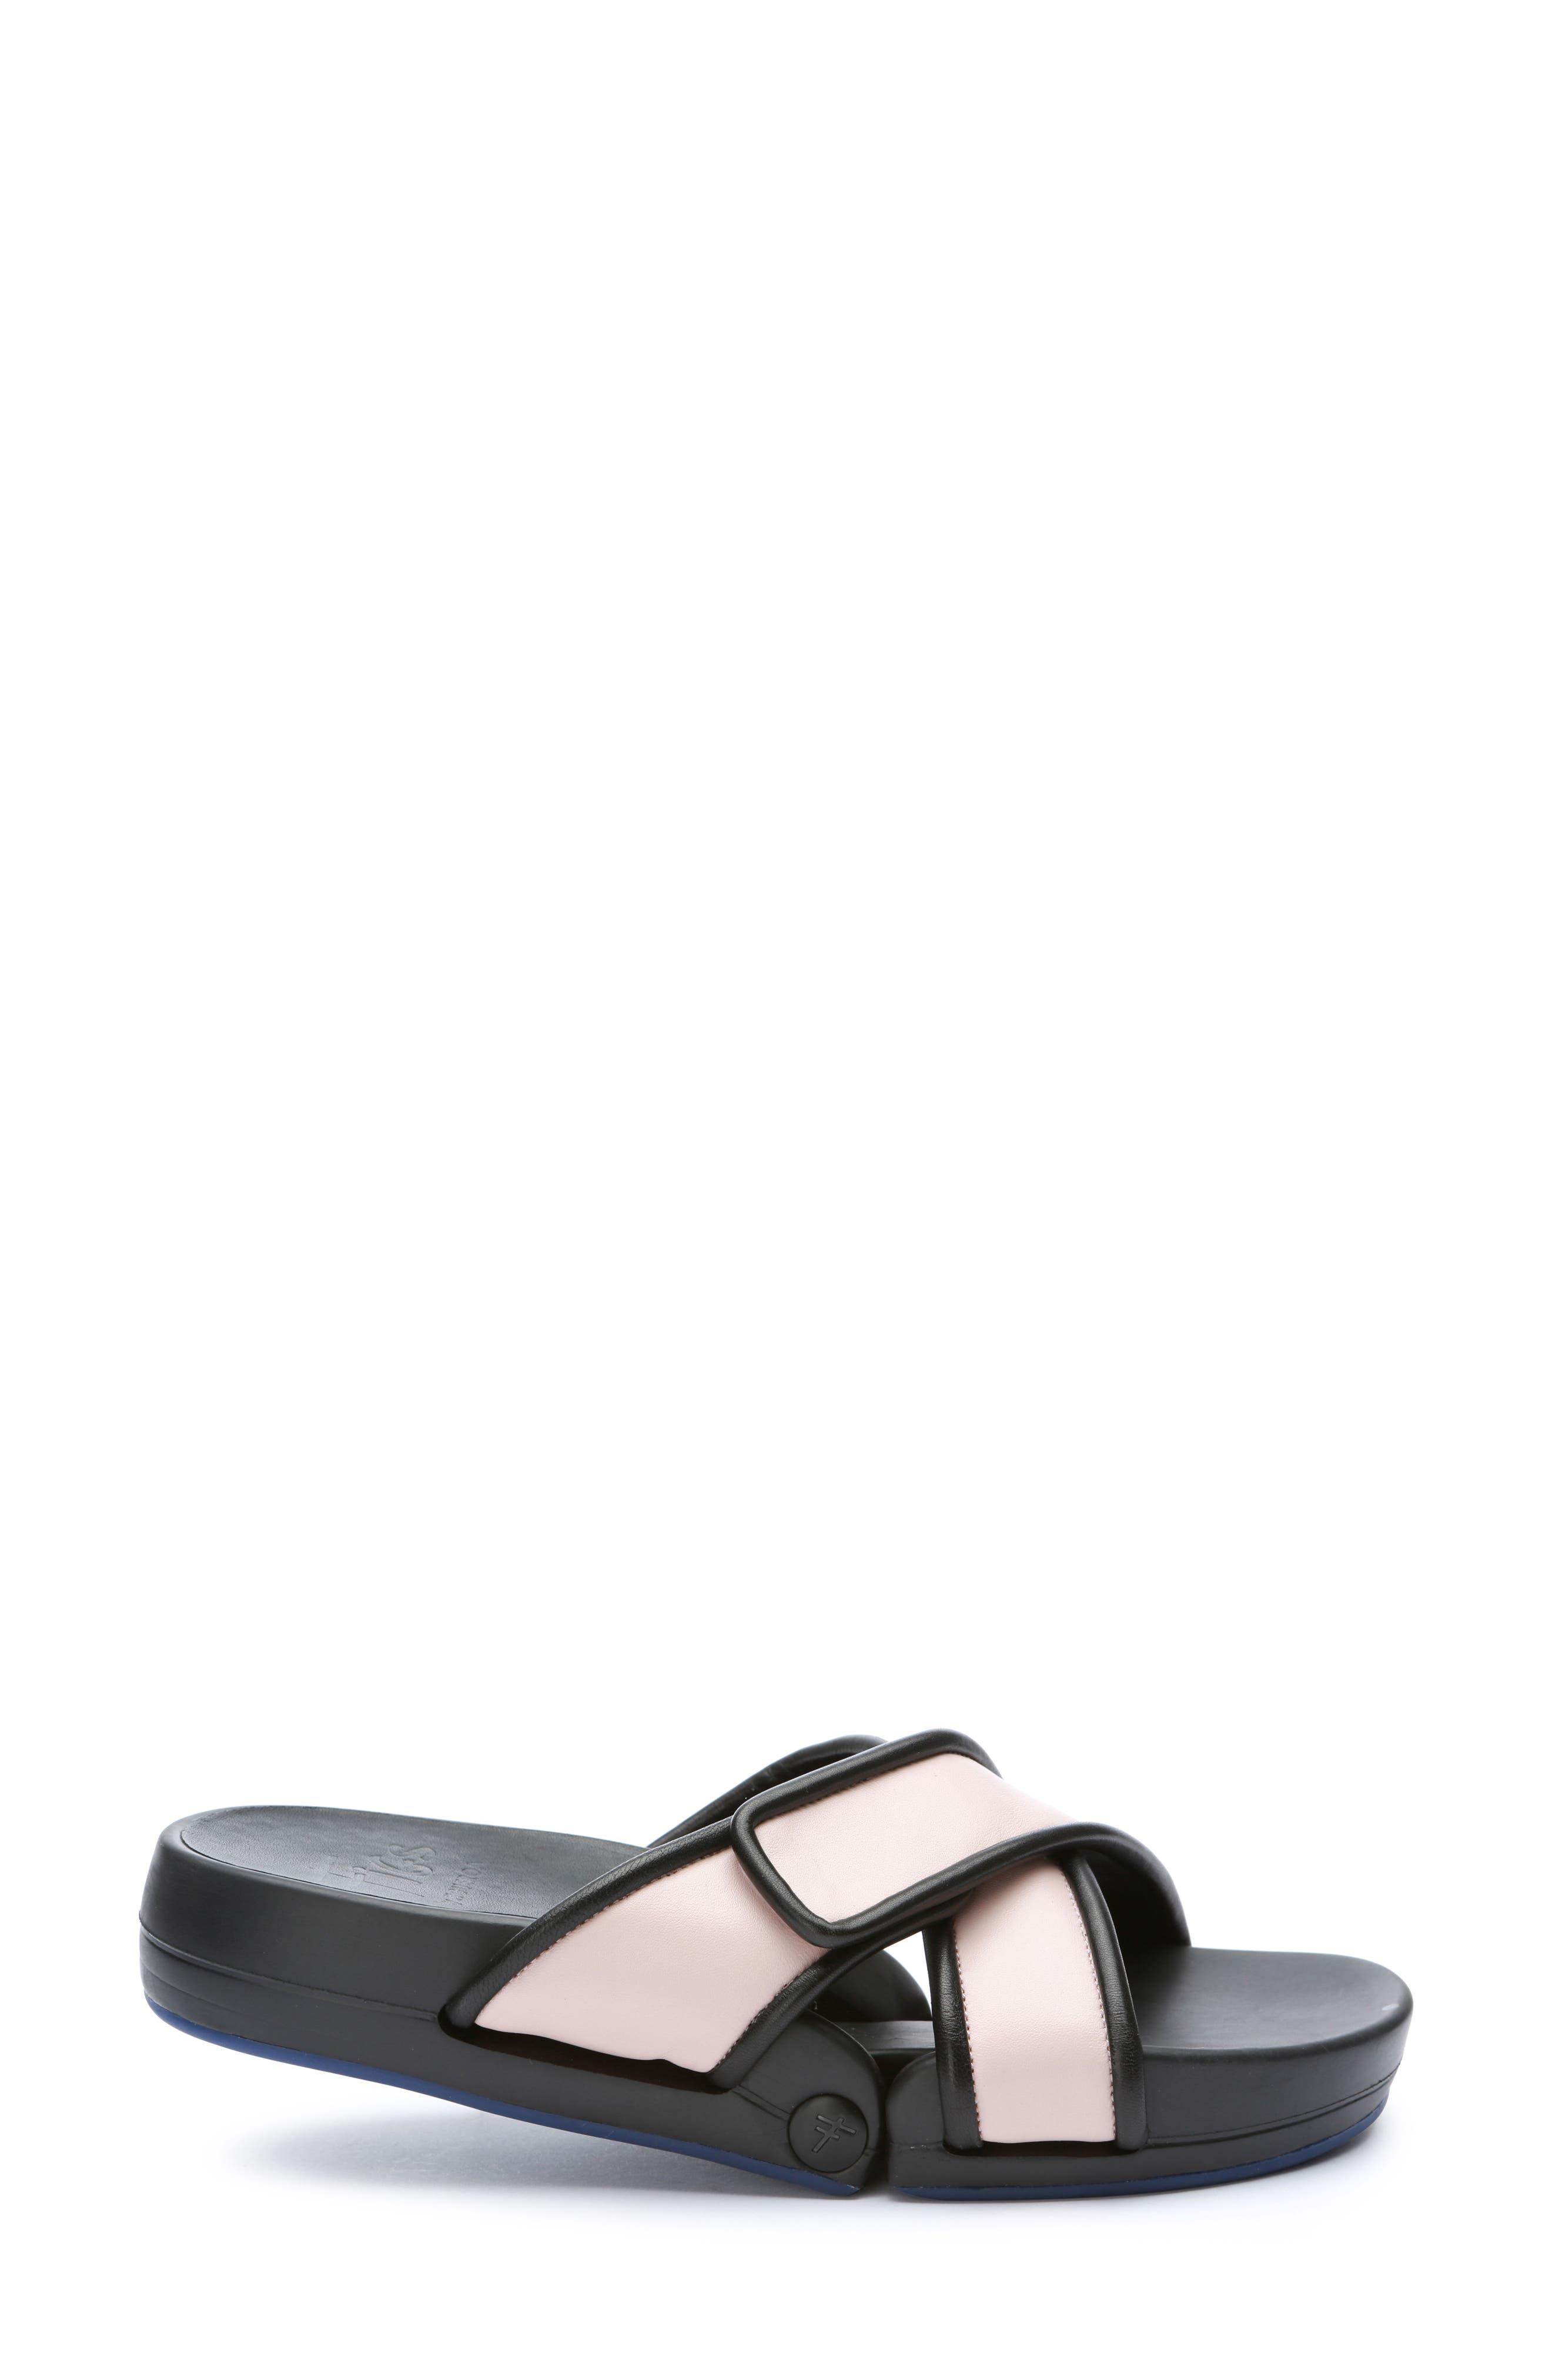 Figomatic Slide Sandal,                             Alternate thumbnail 2, color,                             Pink Nappa Leather